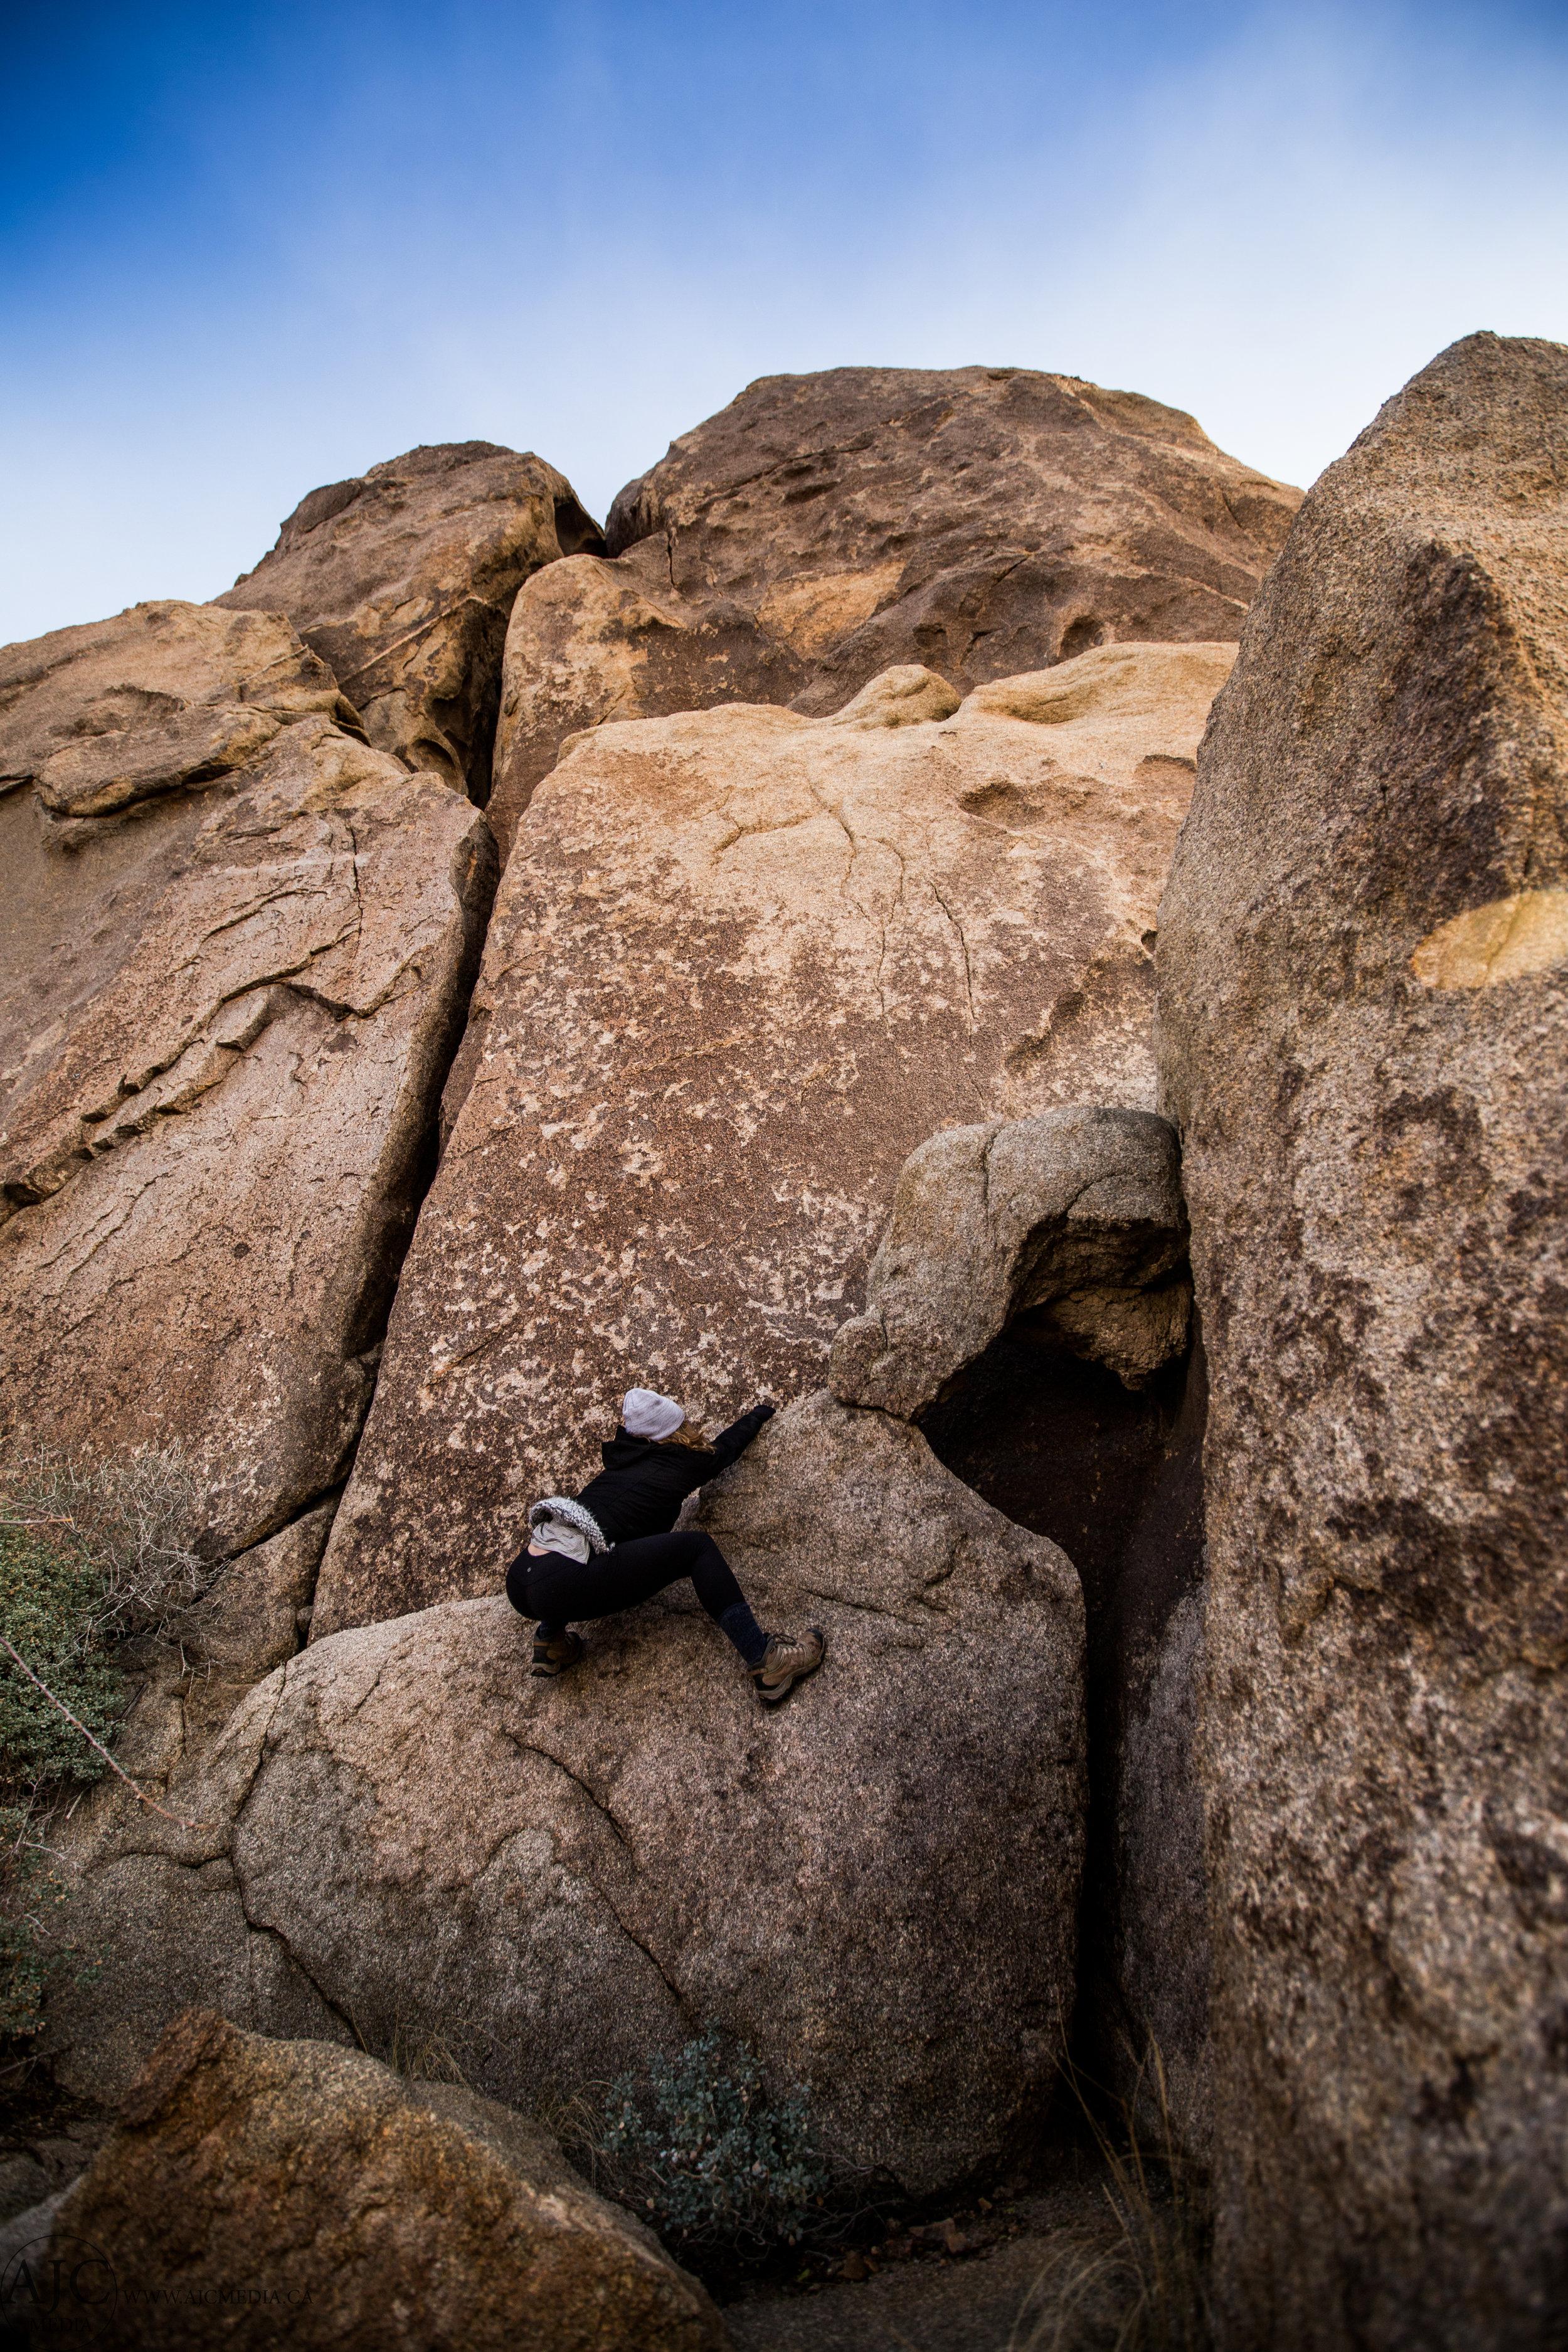 Alison attempting to 'boulder'